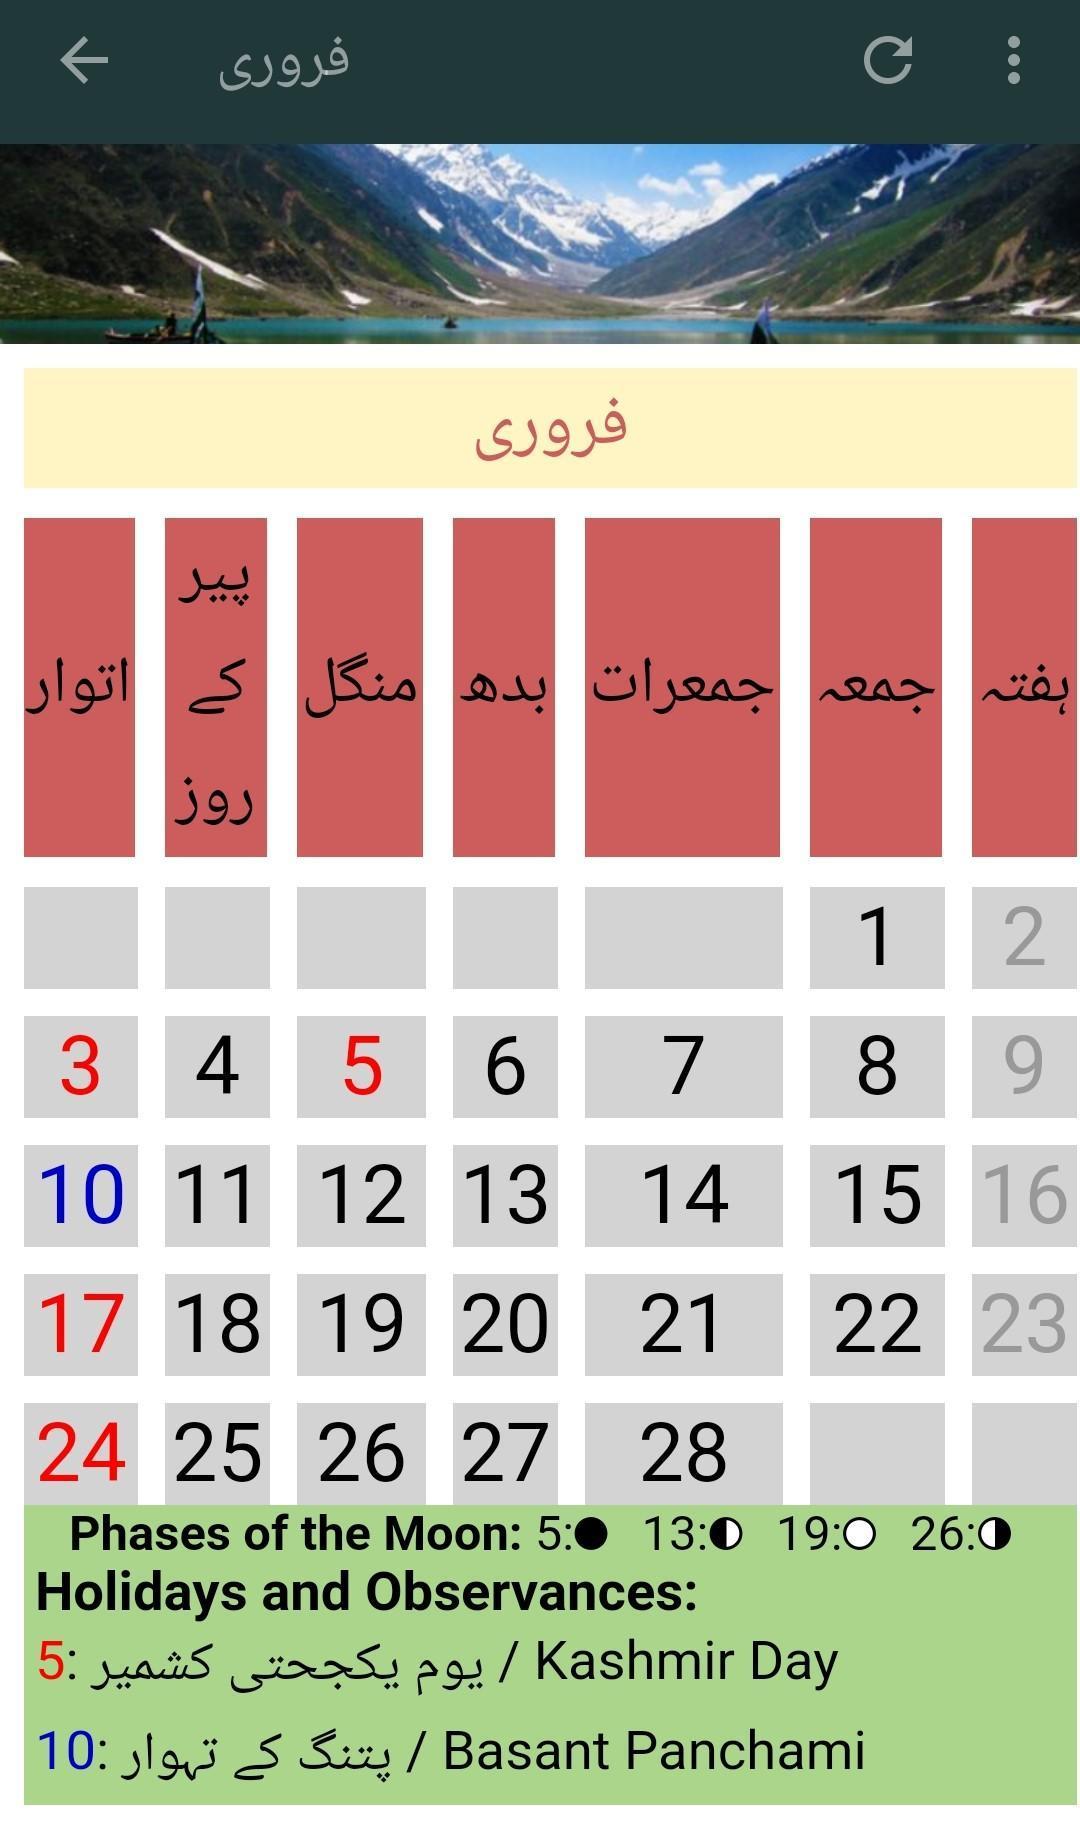 Pakistan Calendar 2019 for Android - APK Download